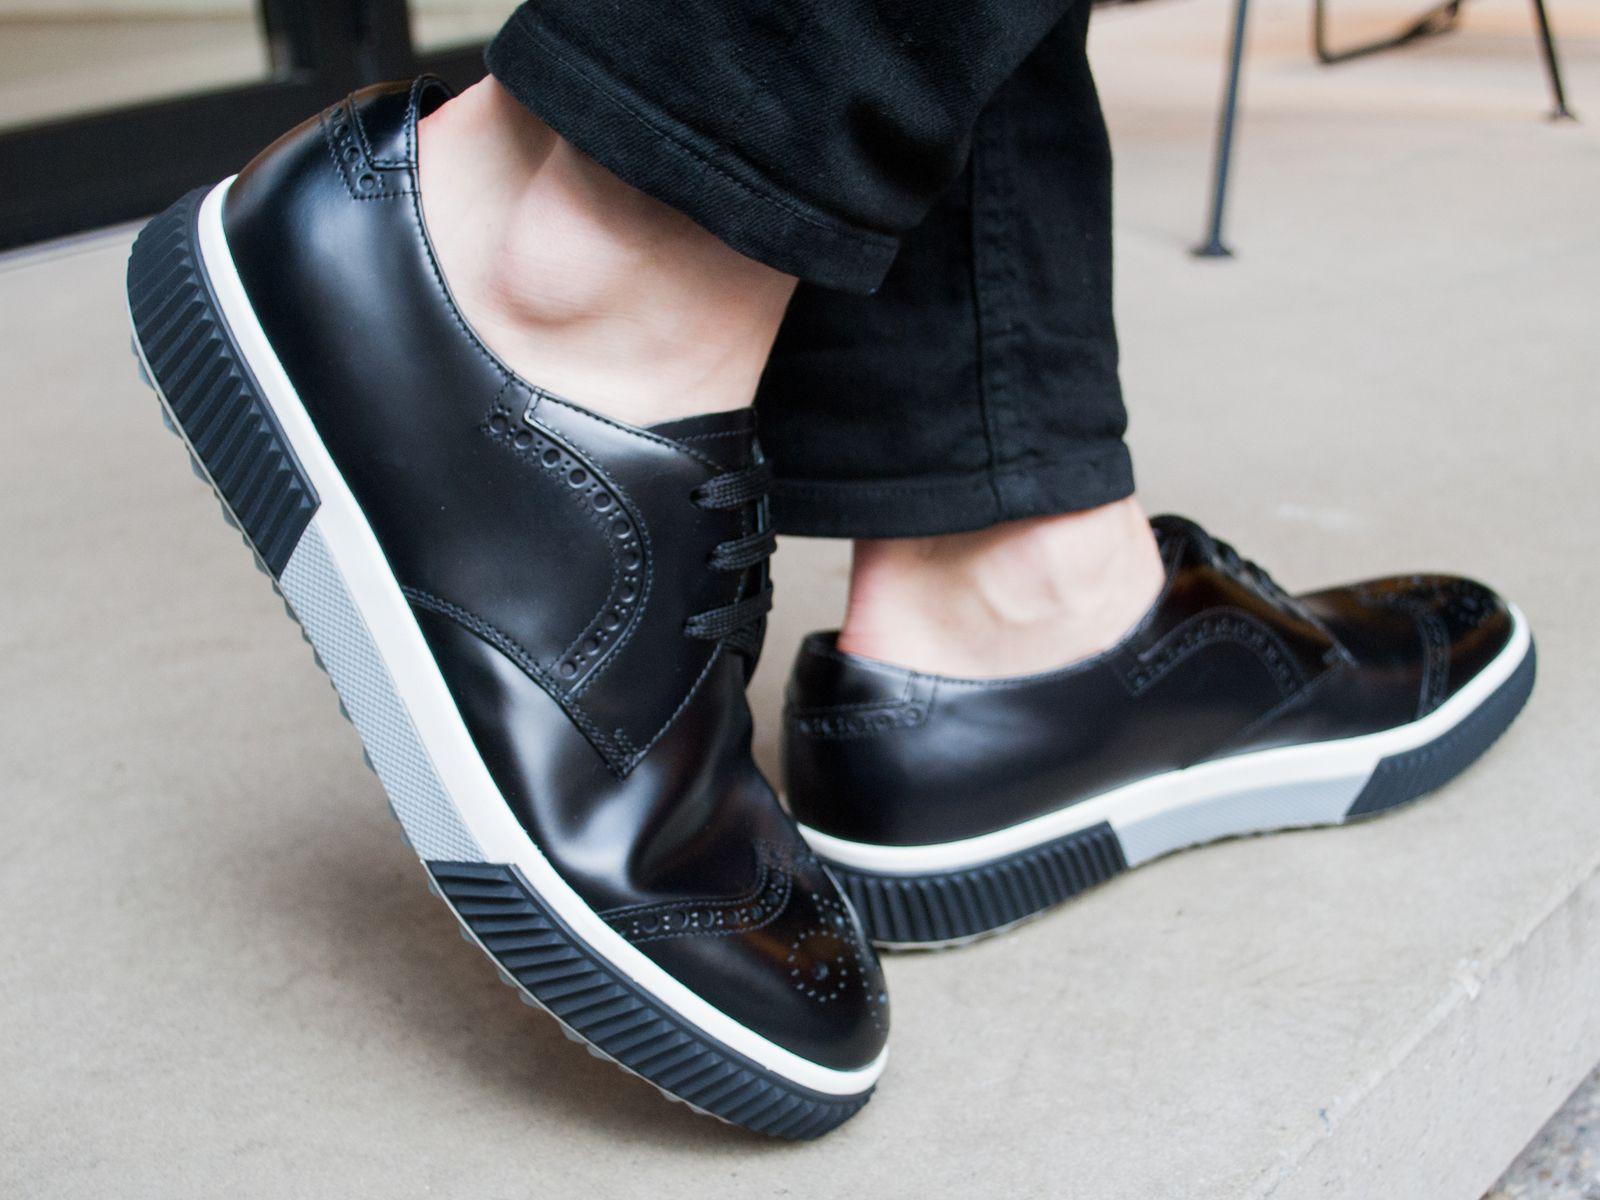 MOVE THIS WAY #prada #shoes #sneaker #sotd #acnestudios